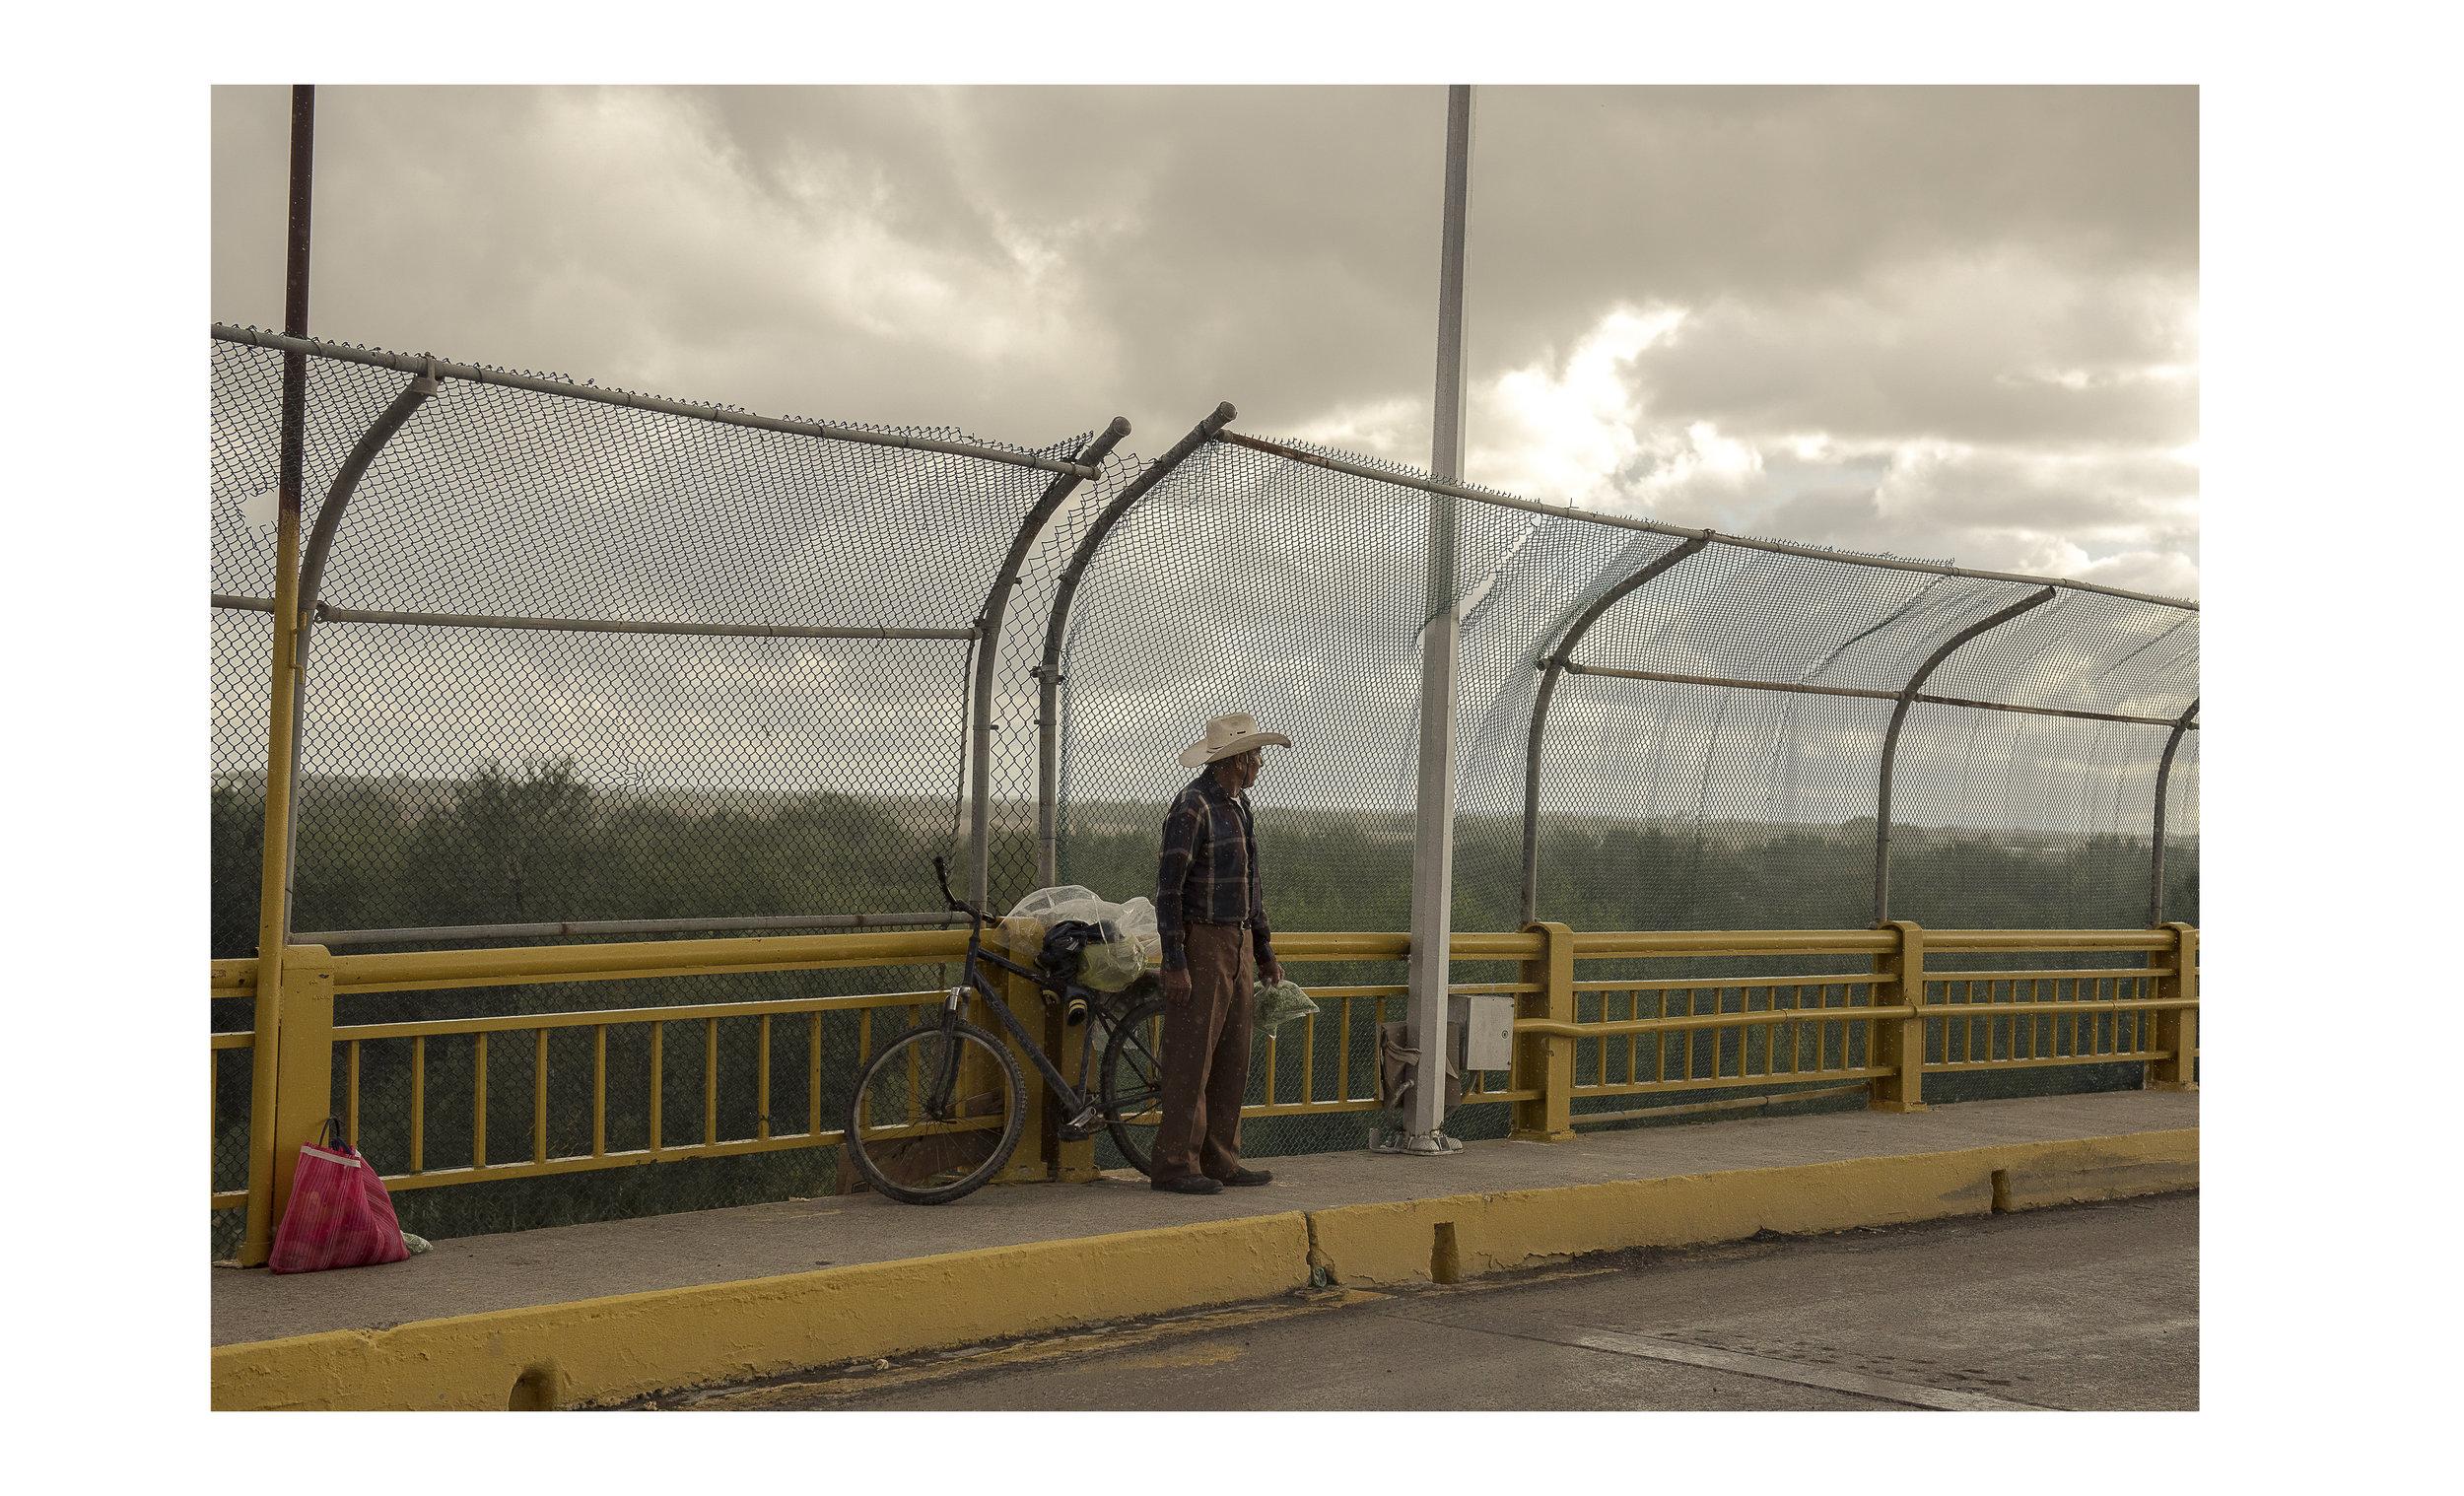 bridges22.jpg